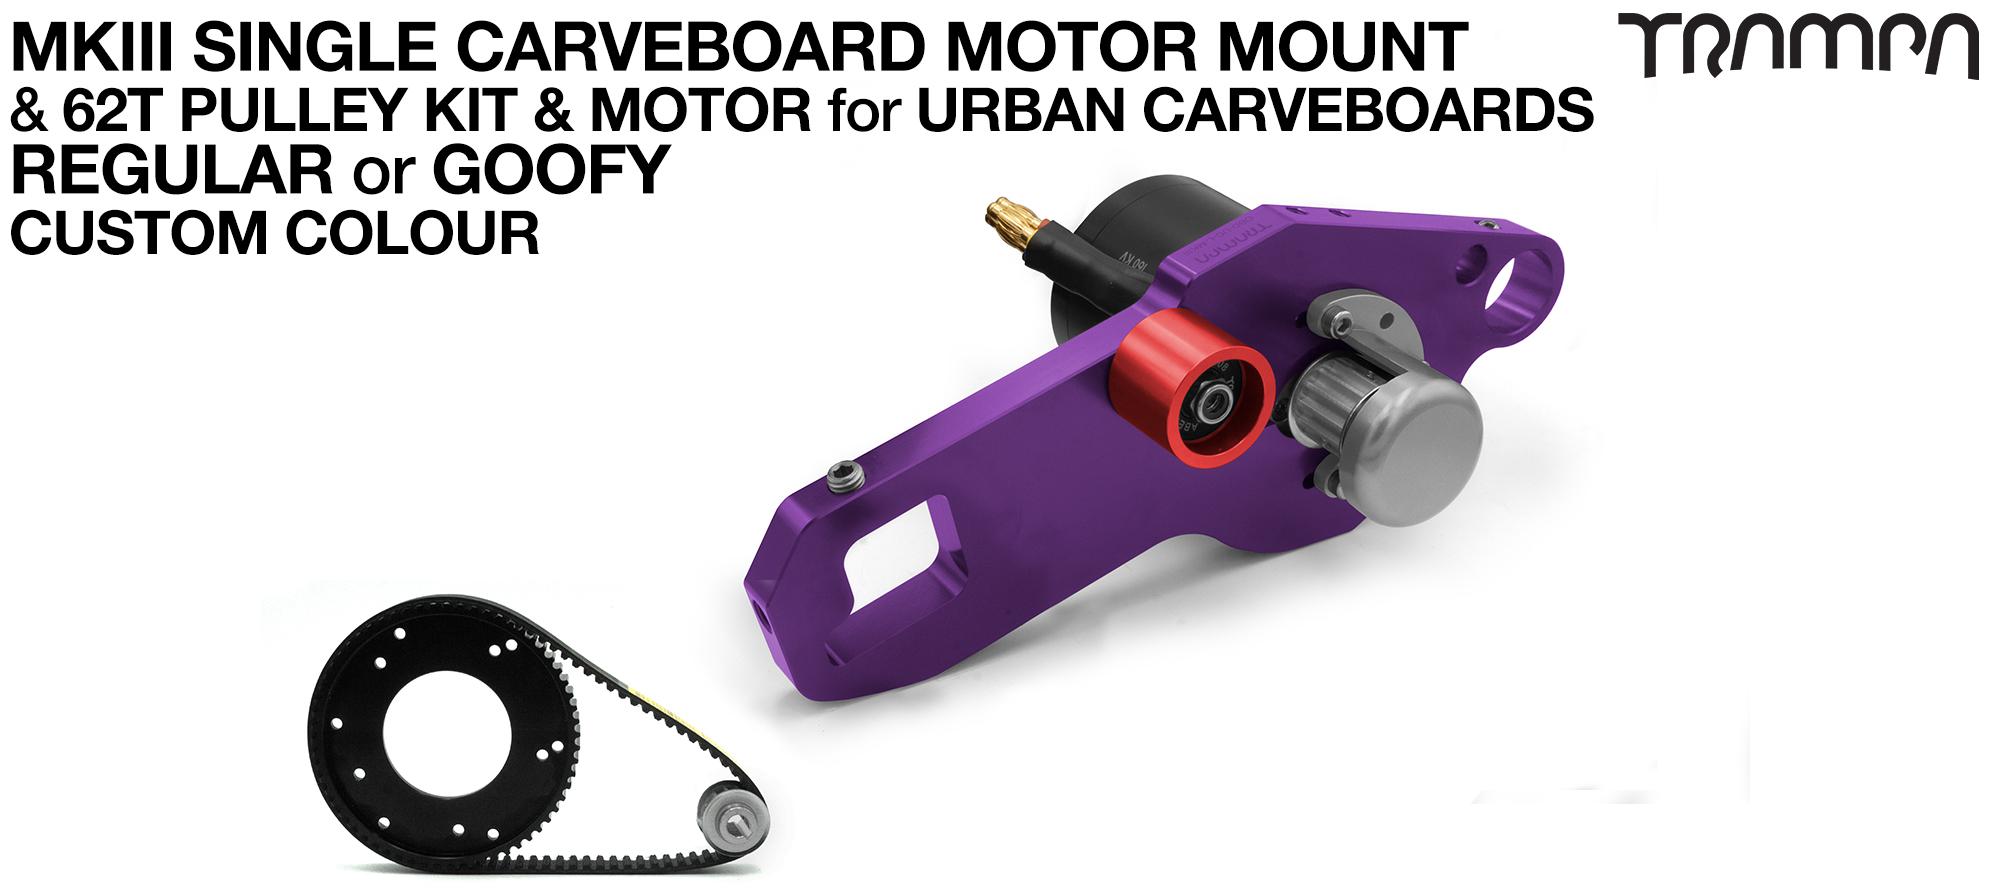 MkIII URBAN CARVEBOARD Motormount Connector Panel & 62 Tooth Pulley Kit & Motor - SINGLE